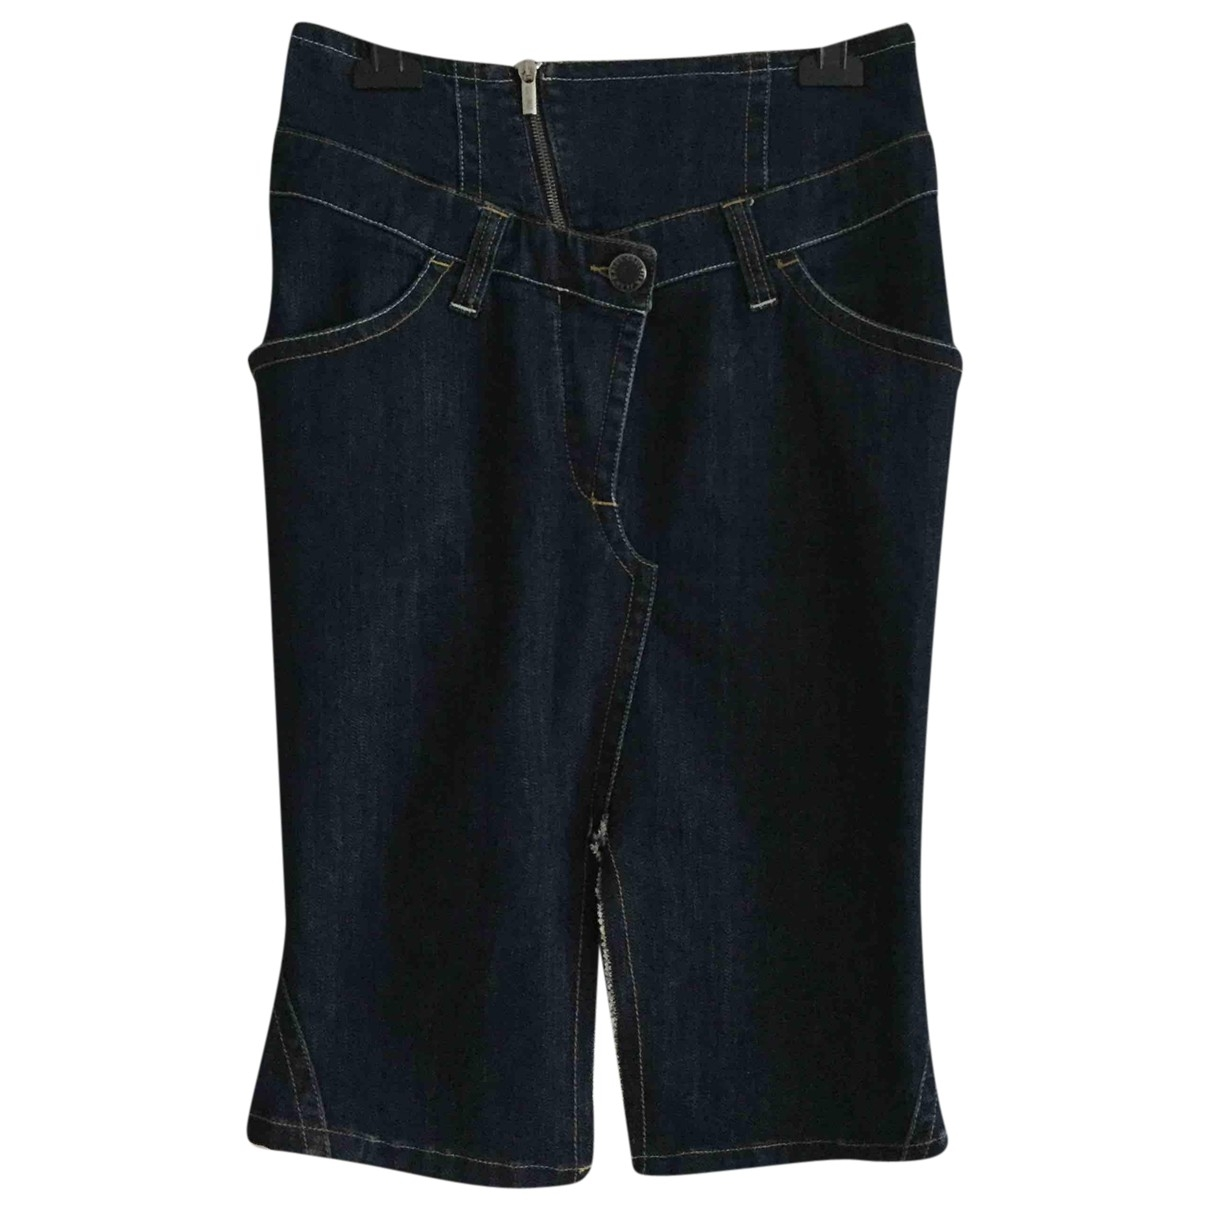 Jean Paul Gaultier \N Blue Cotton skirt for Women 40 FR